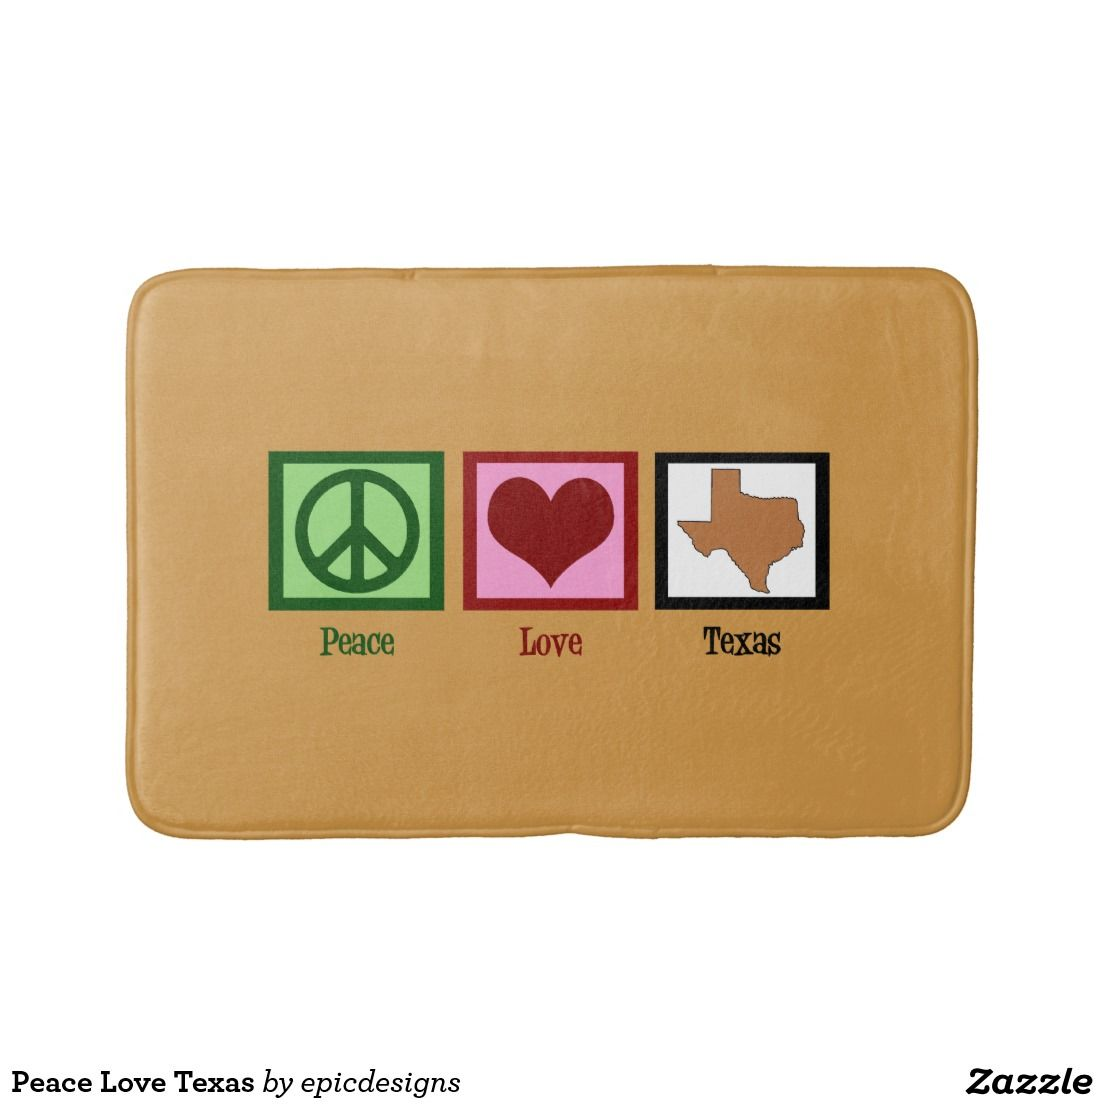 Peace Love Texas Bath Mats